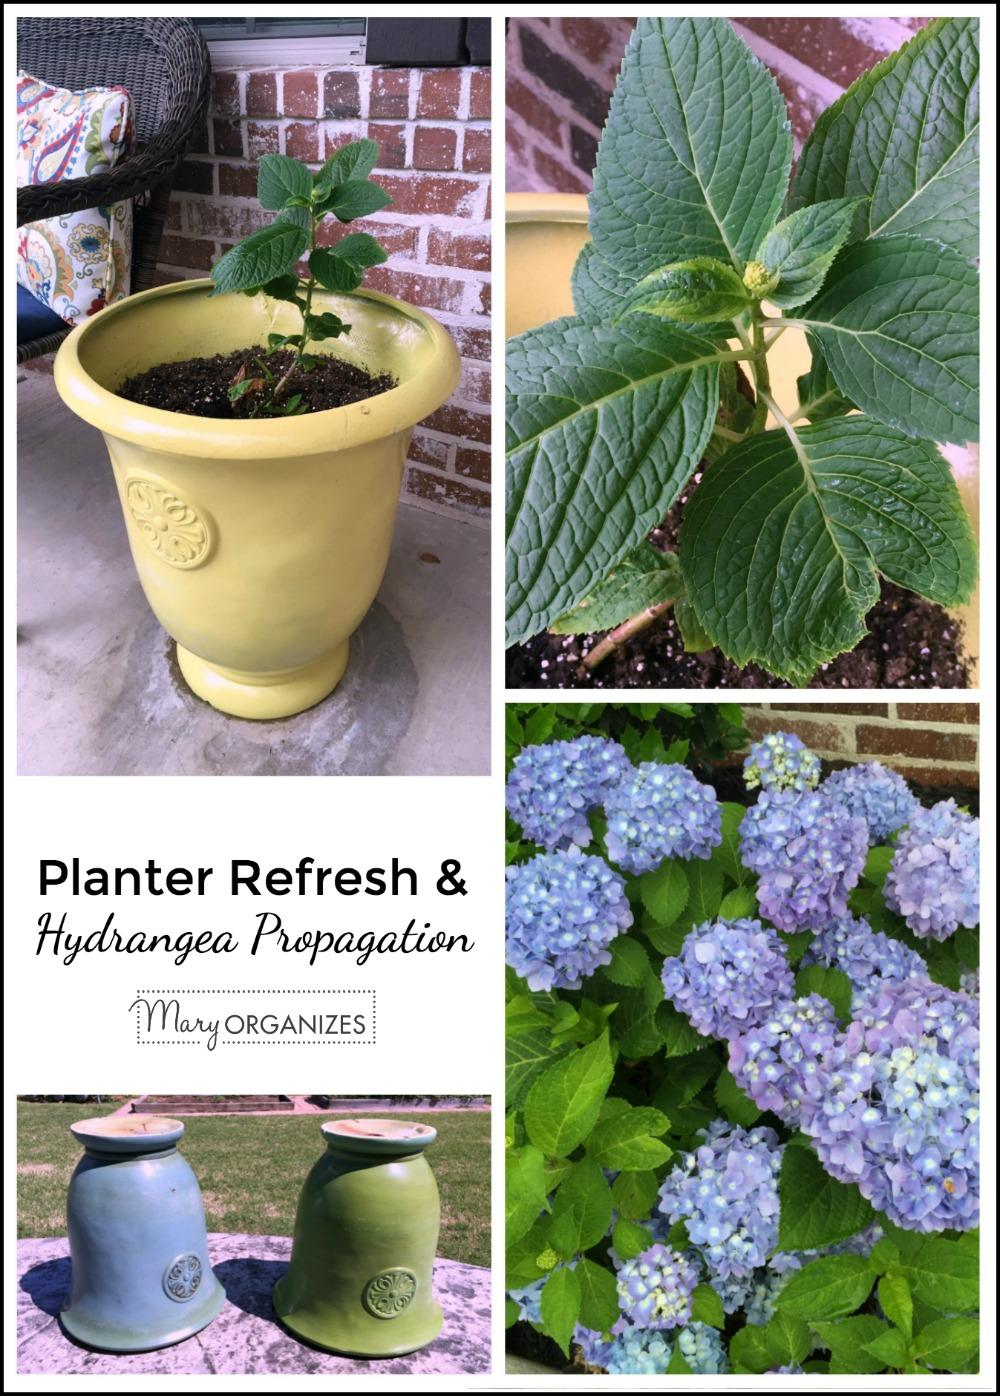 Planters Refresh and Hydrangea Propagation - creatingmaryshome.com